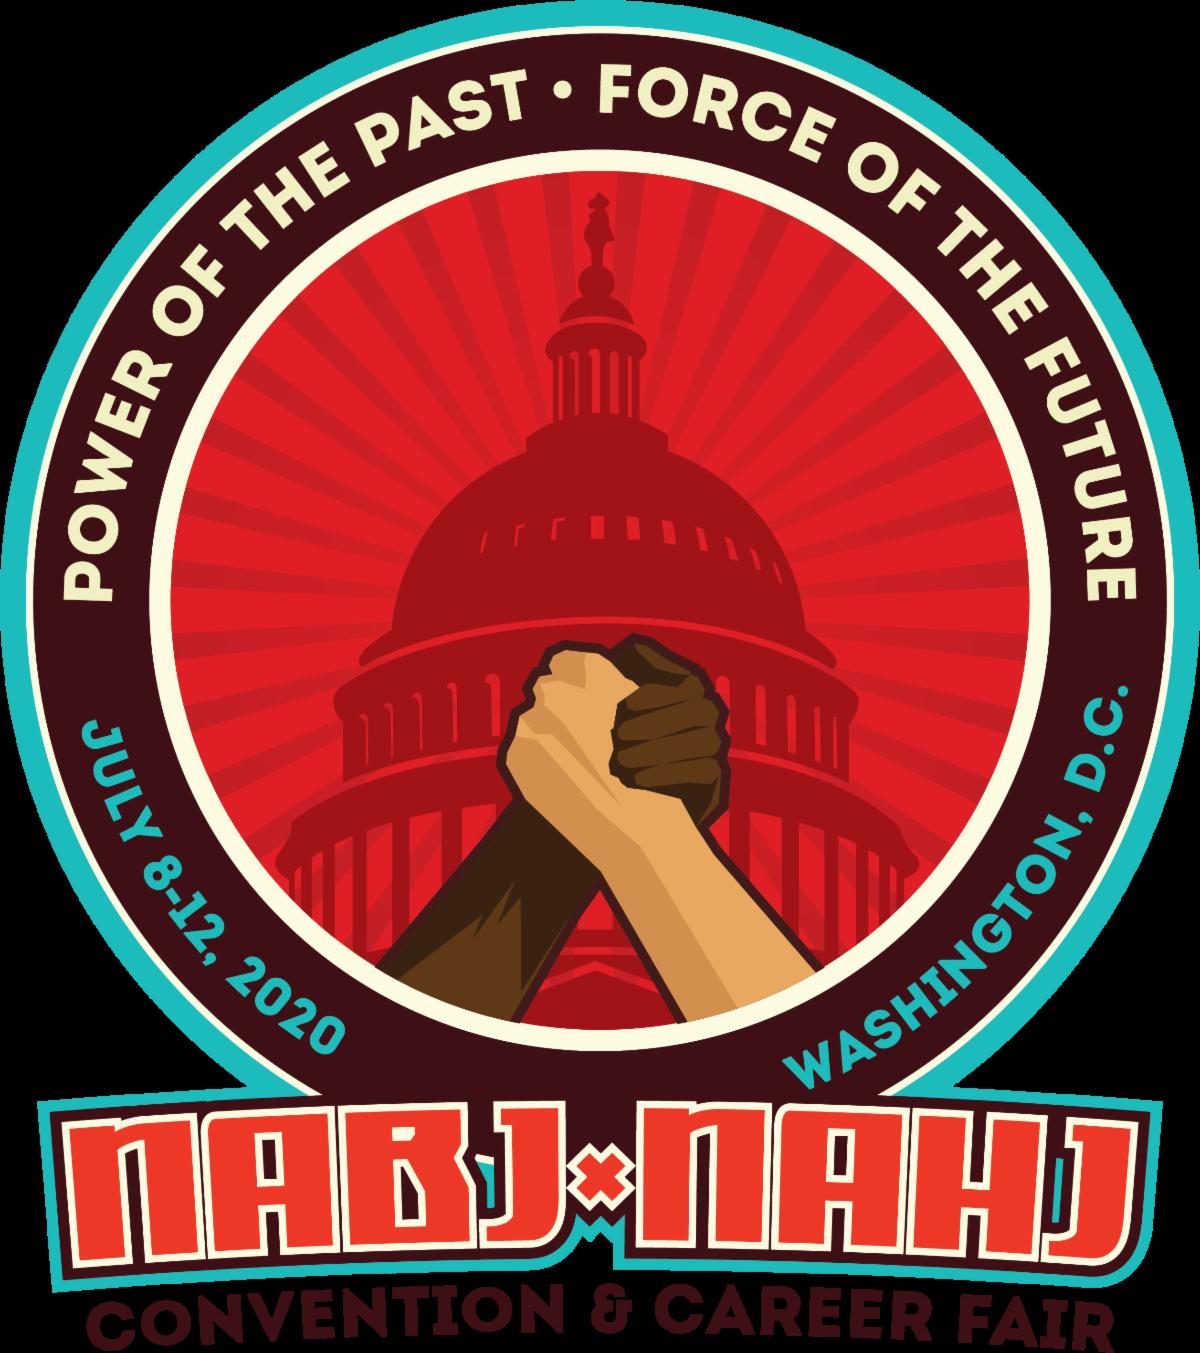 NABJ, NAHJ Announce 2020 Convention & Career Fair Theme and Logo - HABJ -  Houston Association of Black Journalists